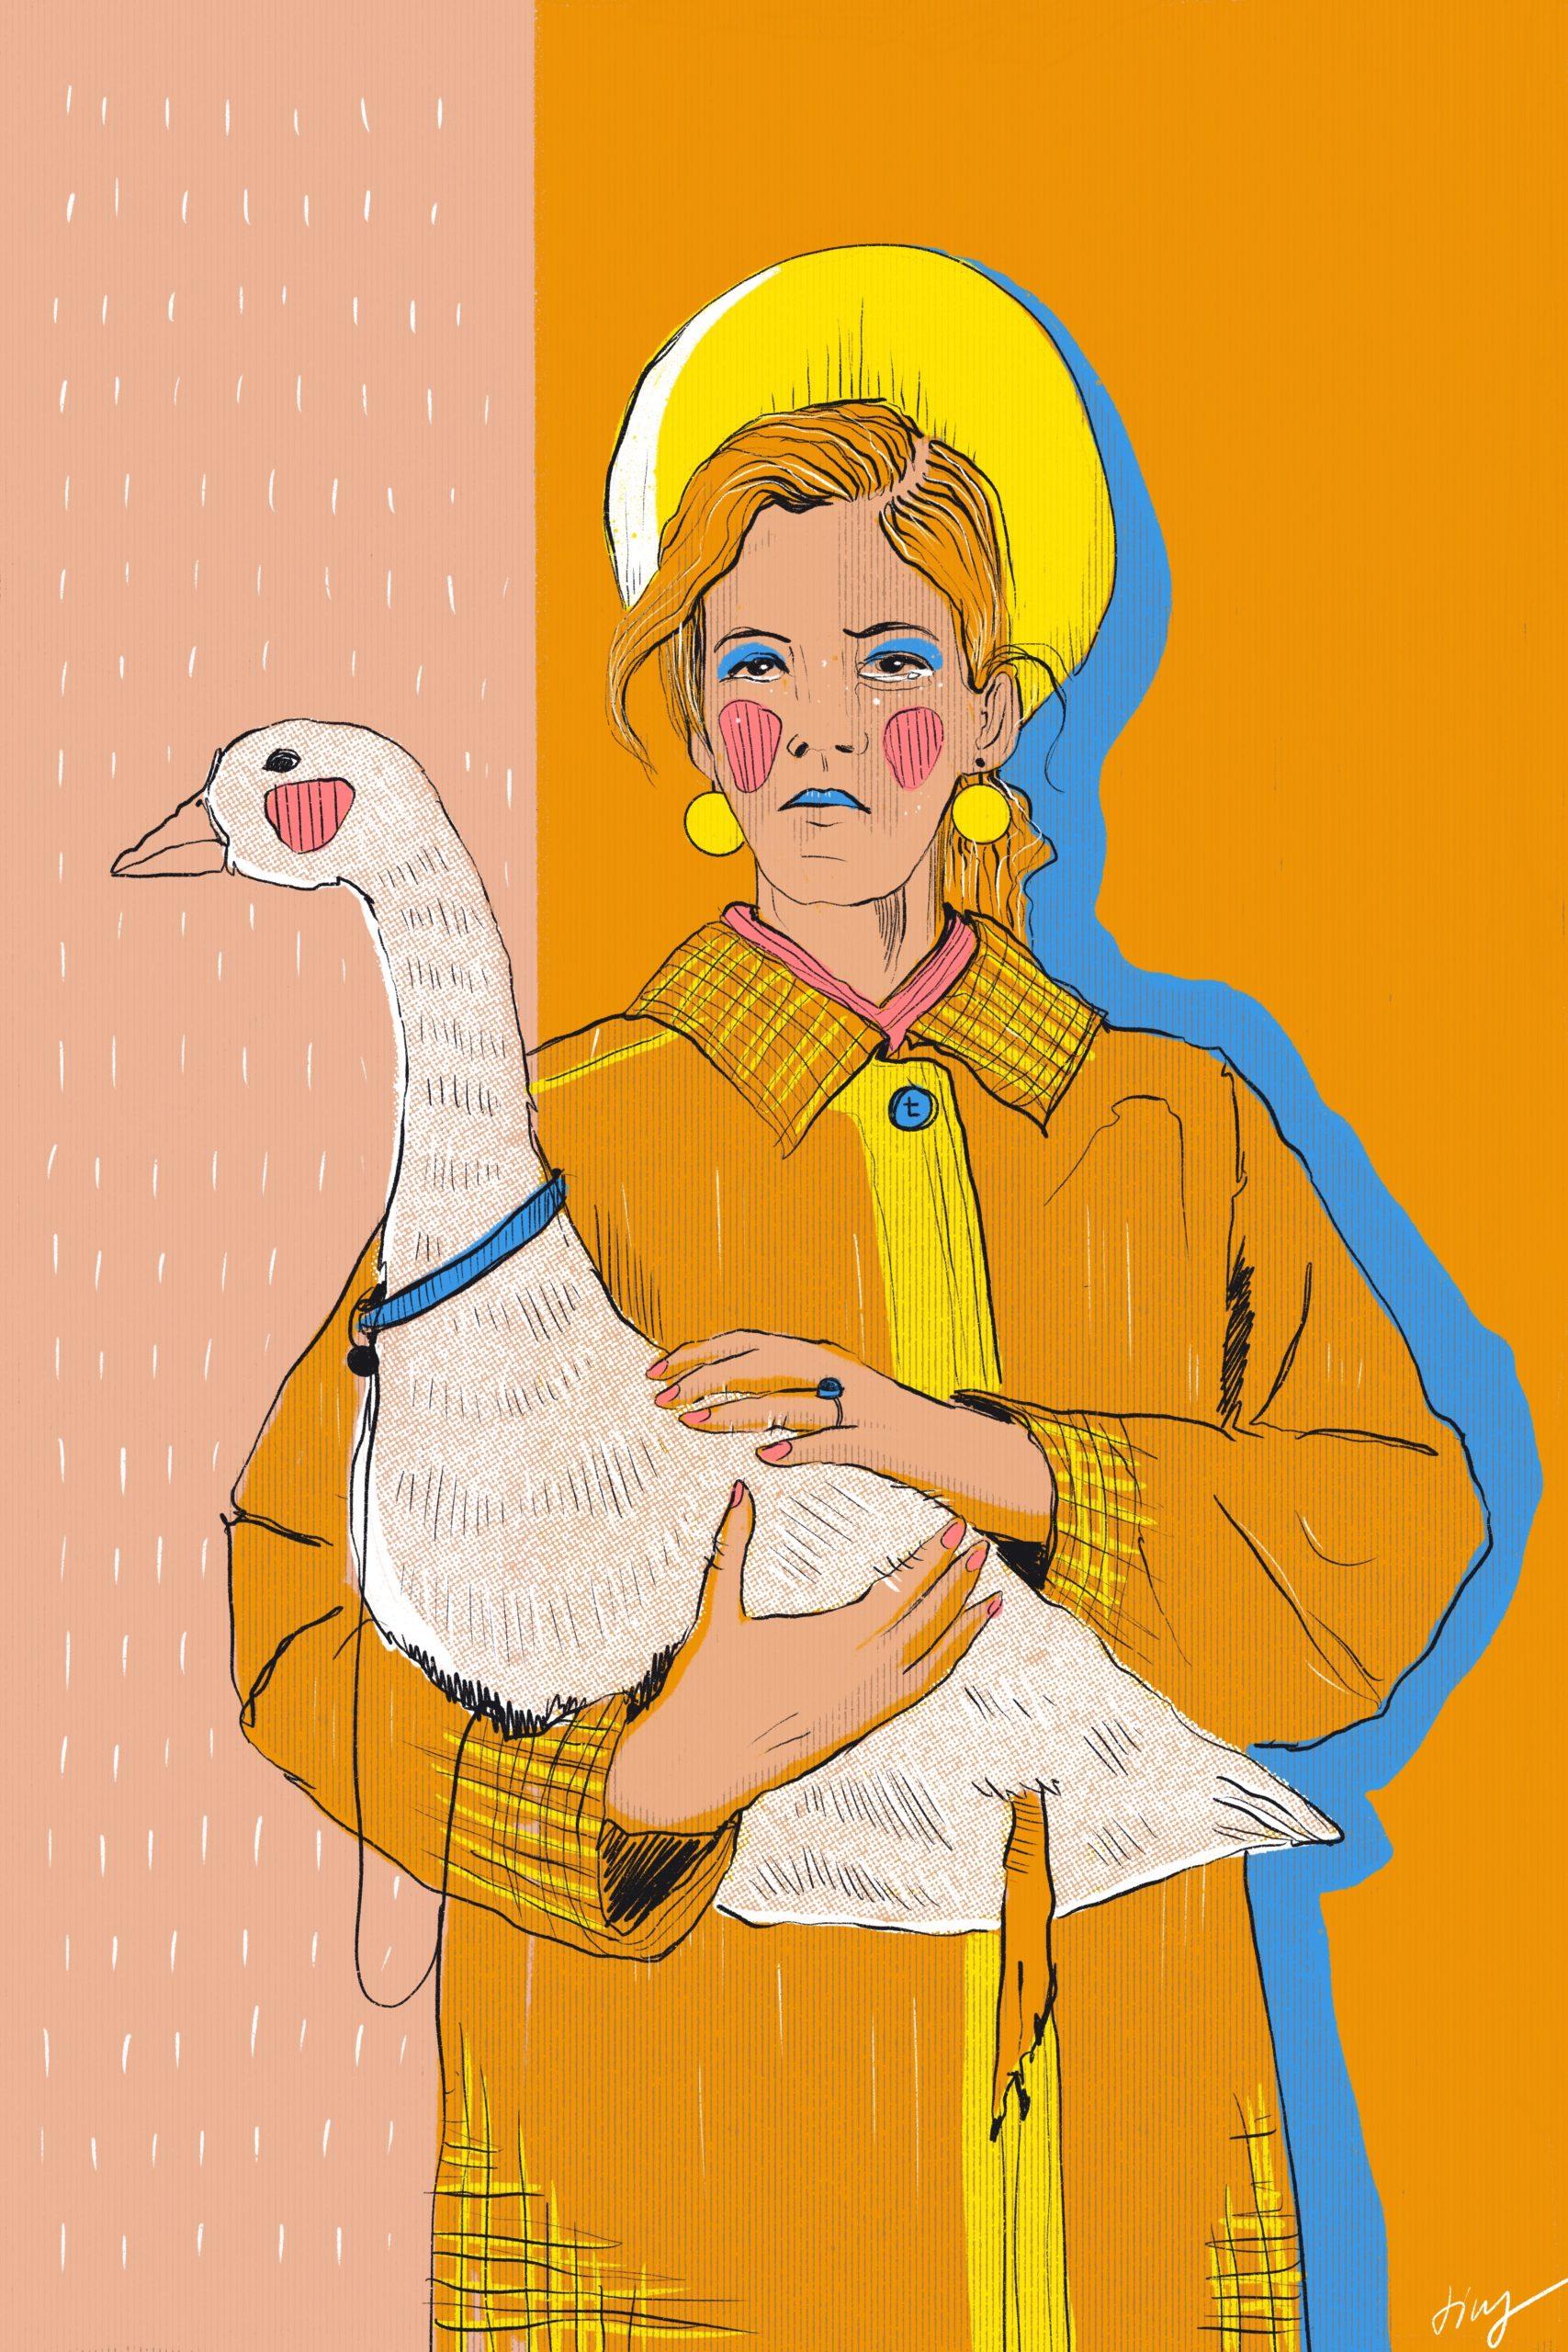 Comic Illustration Goose Gans Frau Mantel Regen Rain Hausmauer Sparzierengehen